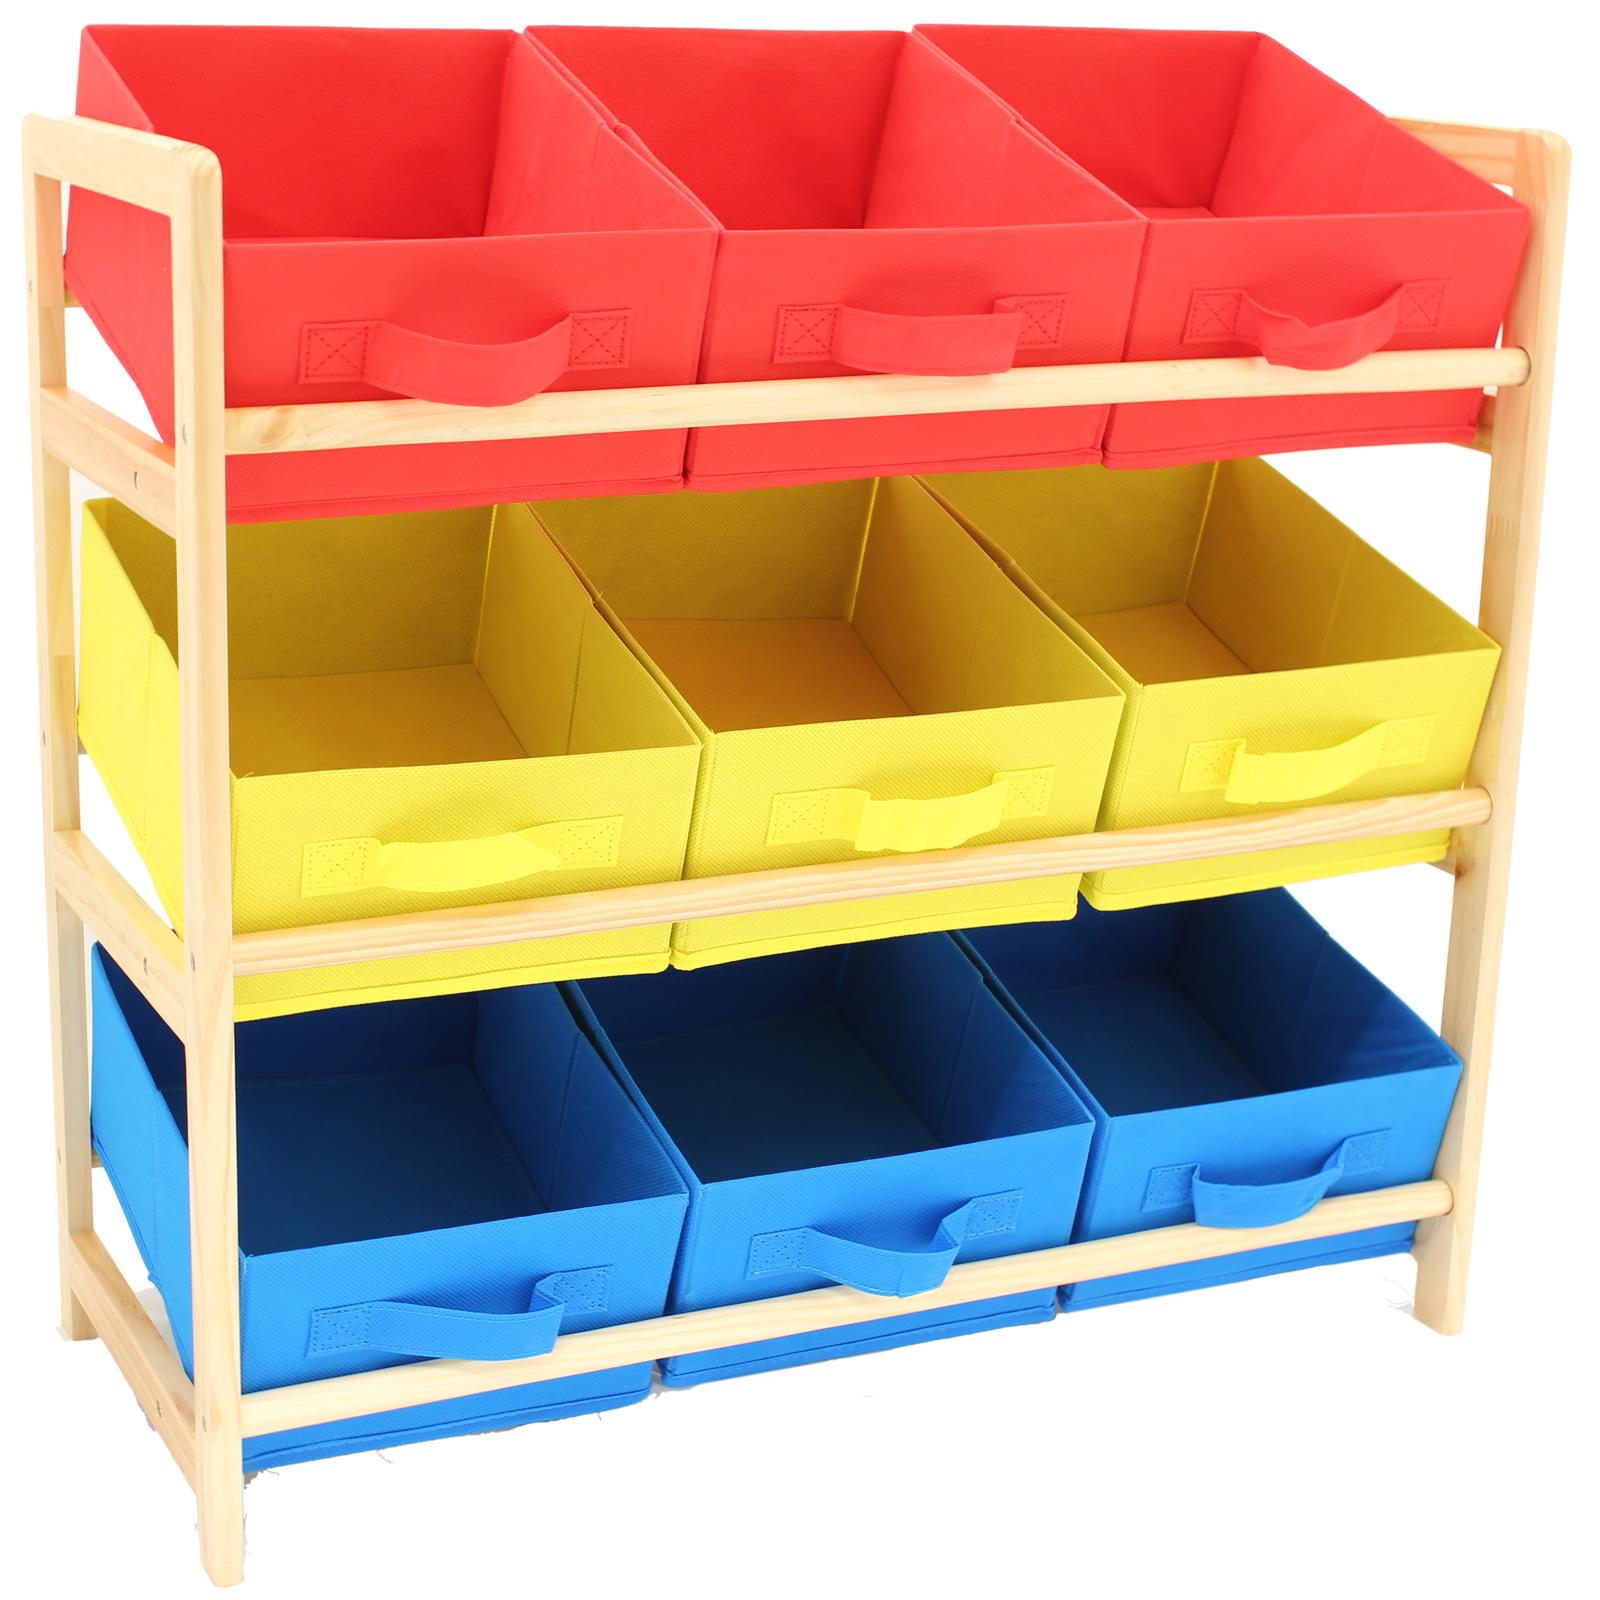 Kids Storage Cube Organizer Toy Box Kids Bedroom Furniture: Hartleys 3 Tier Storage Shelf Unit Kids Childrens Bedroom